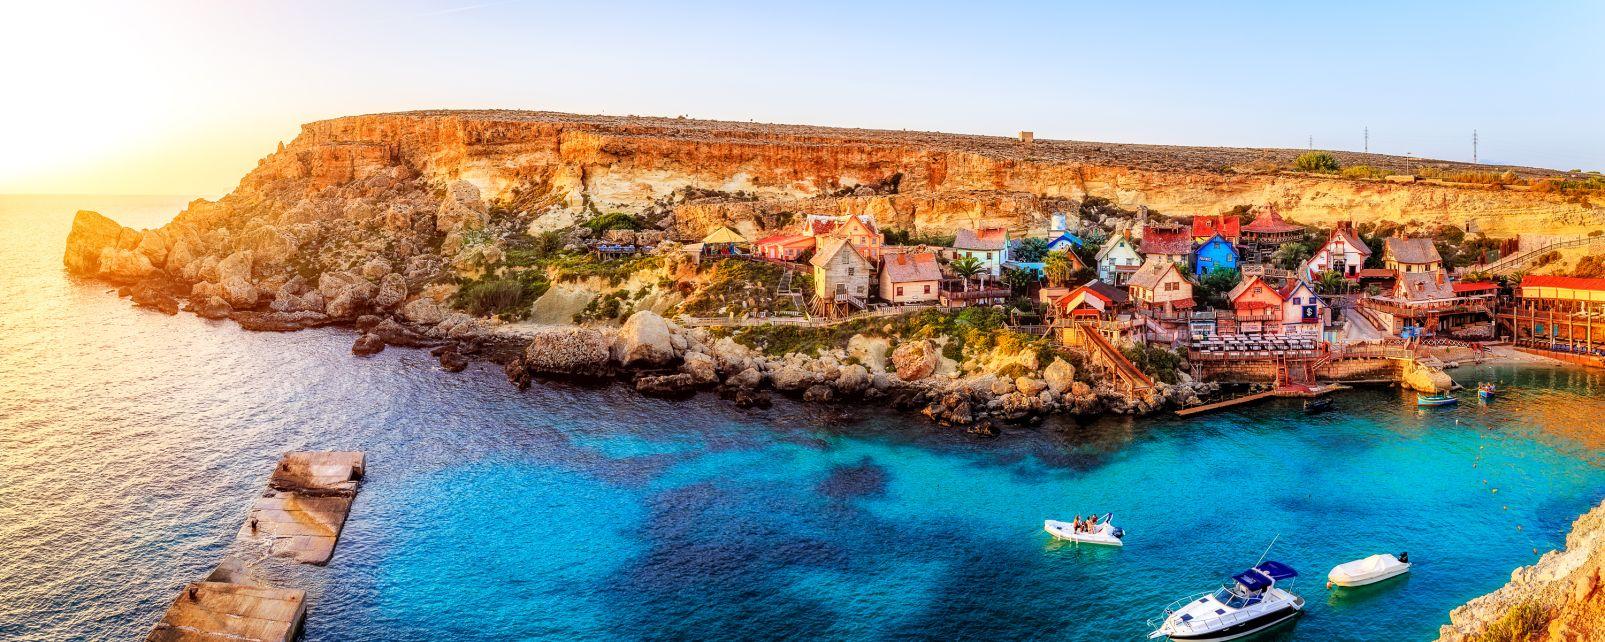 Les arts et la culture, europe, Malte, popeye, village, mer, port, altman, Sweethaven, anchor bay, anchor